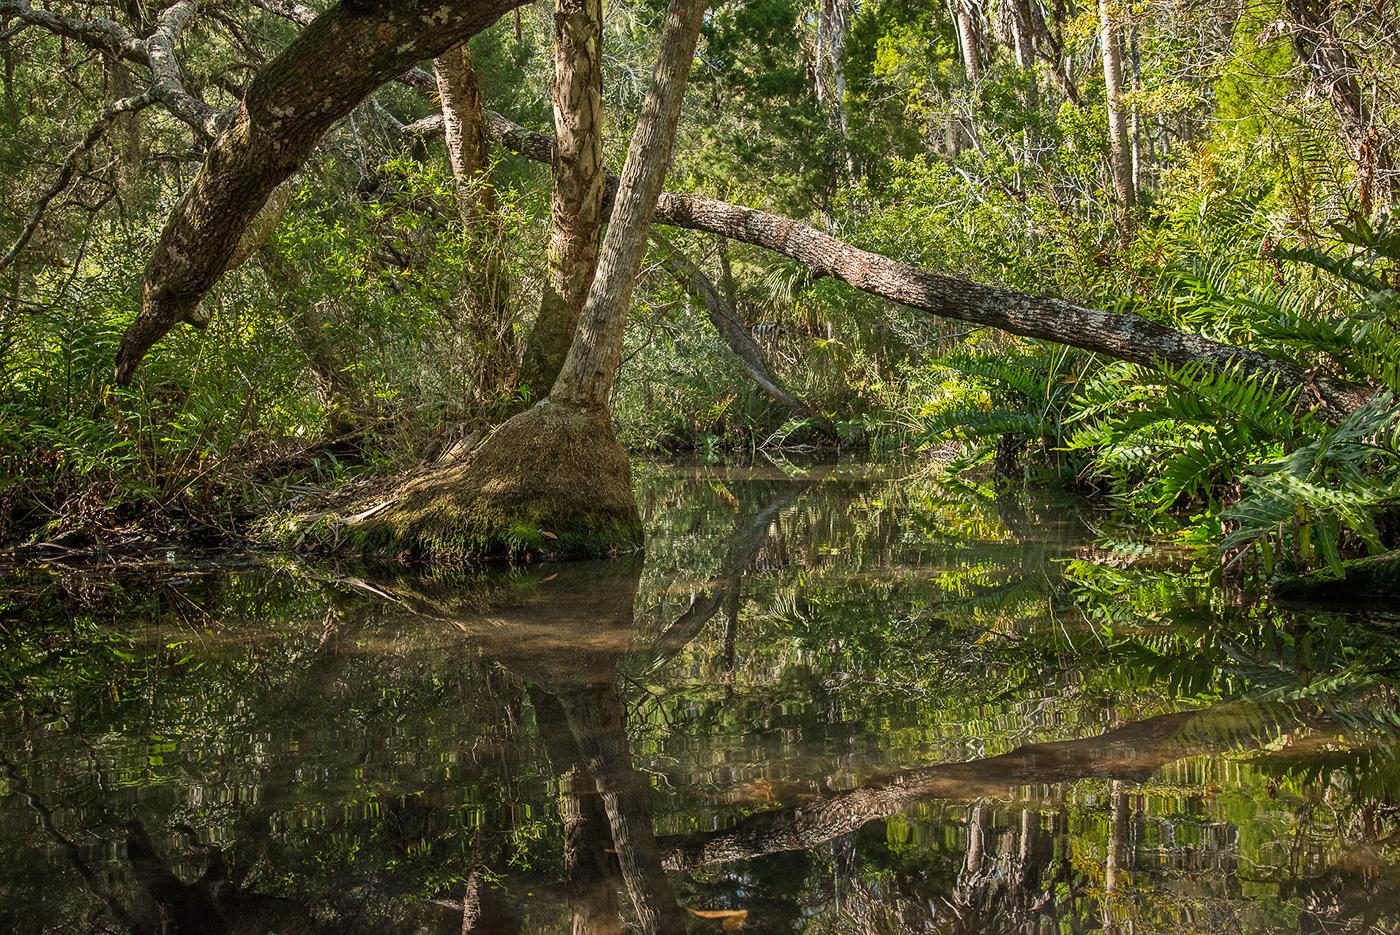 Baird Creek, Primeval Paradise (off the Chassahowitzka River)